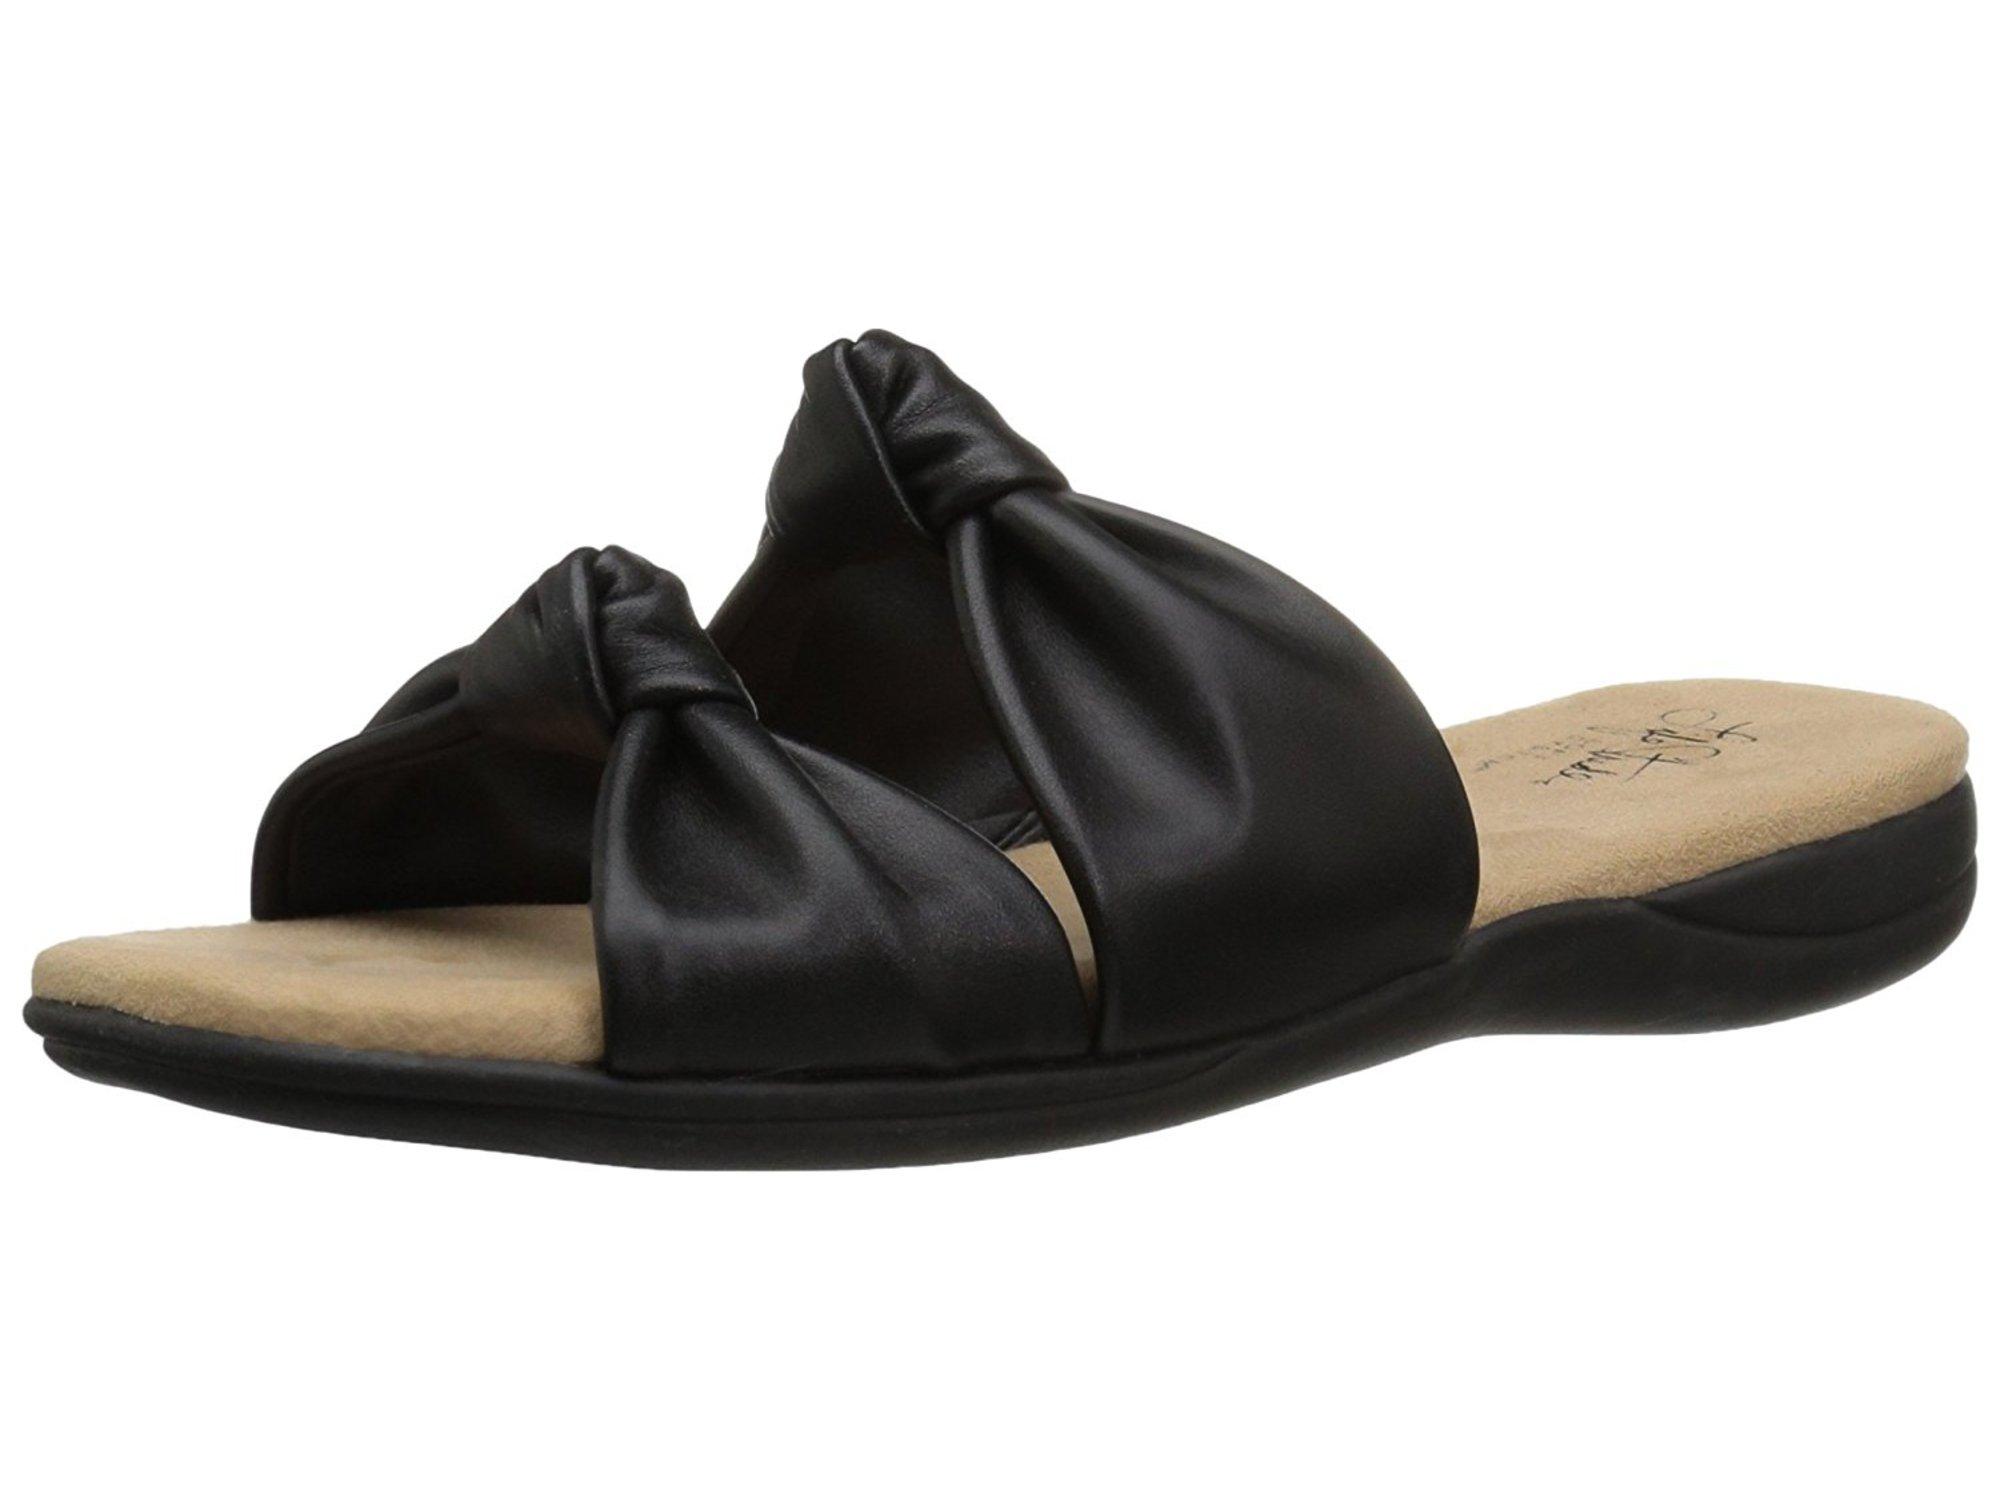 Lifestride Womens Eden Open Toe Casual Slide Sandals by LifeStride